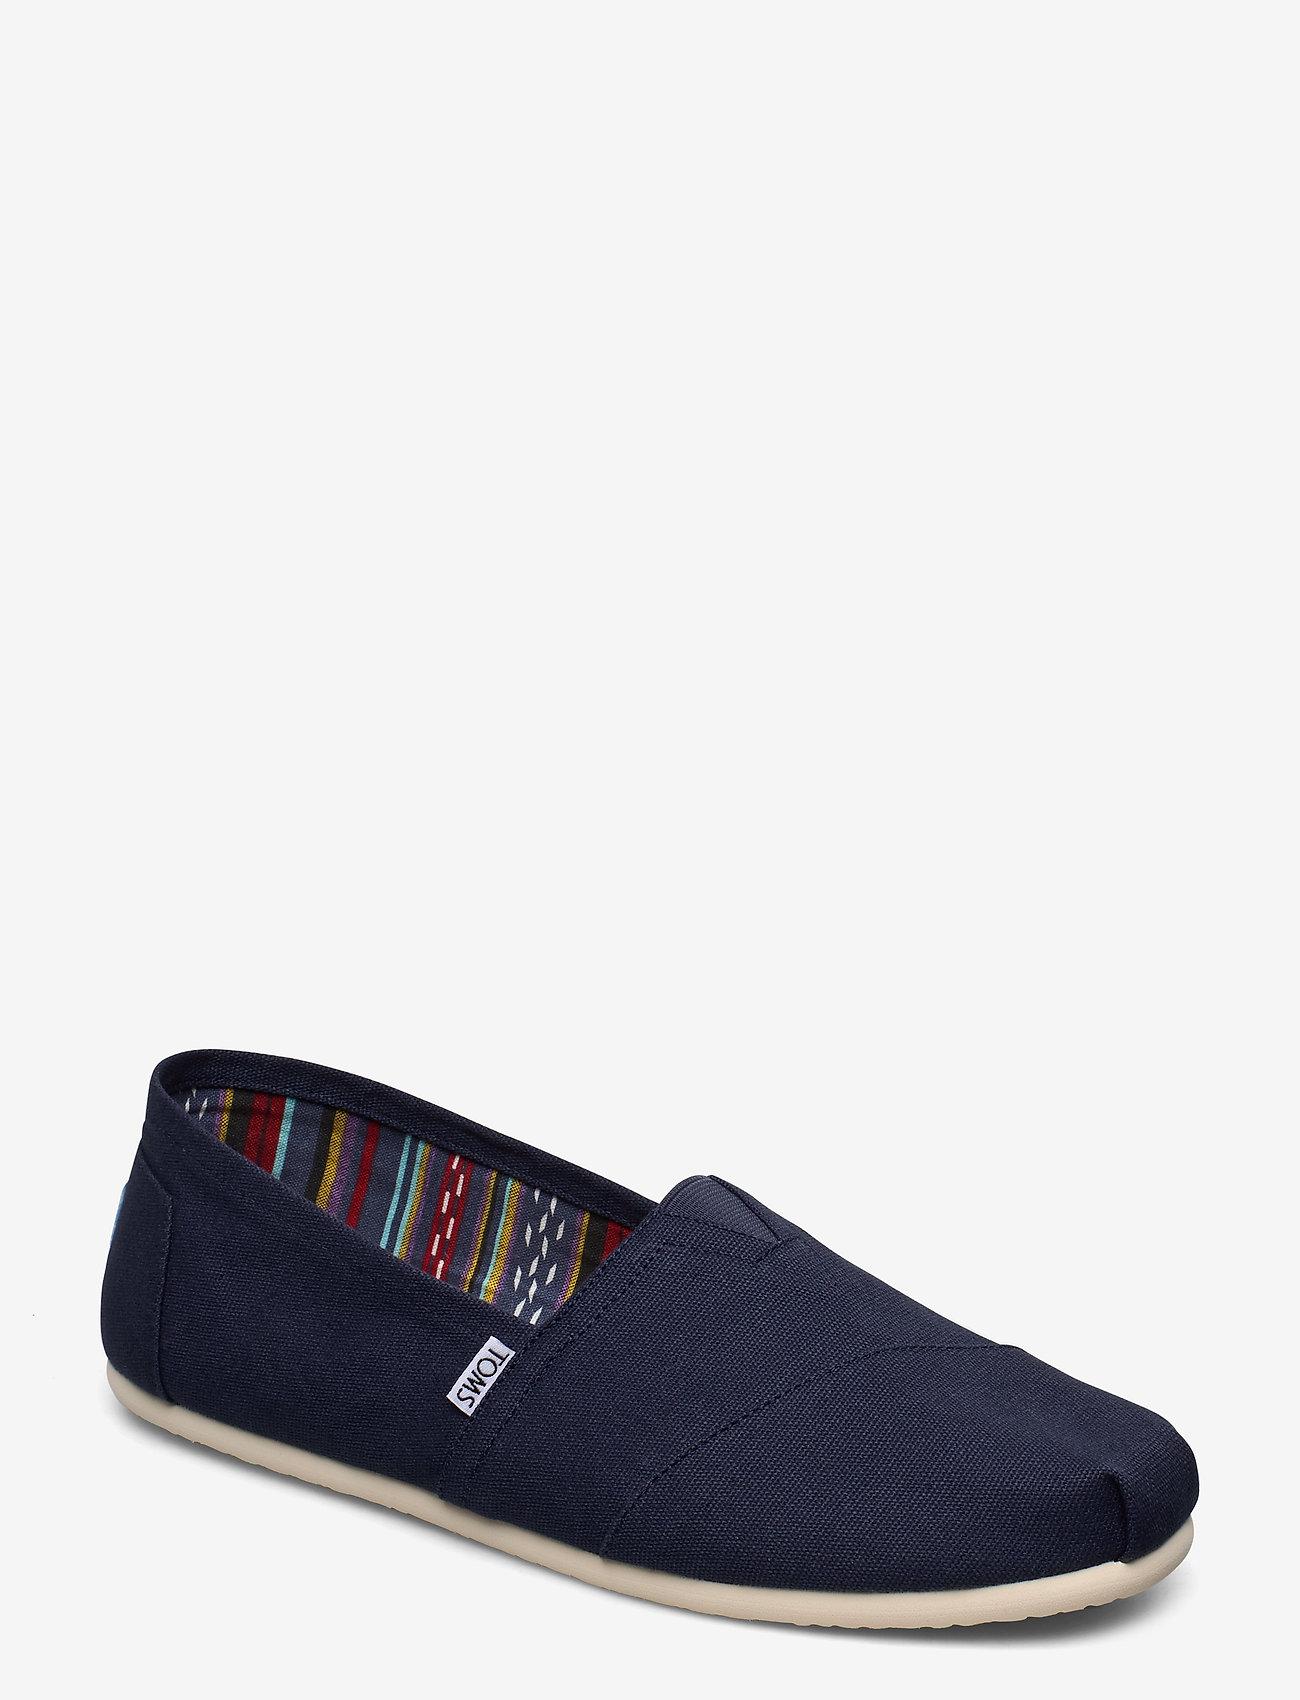 TOMS - Navy Canvas - espadrillos - navy - 0